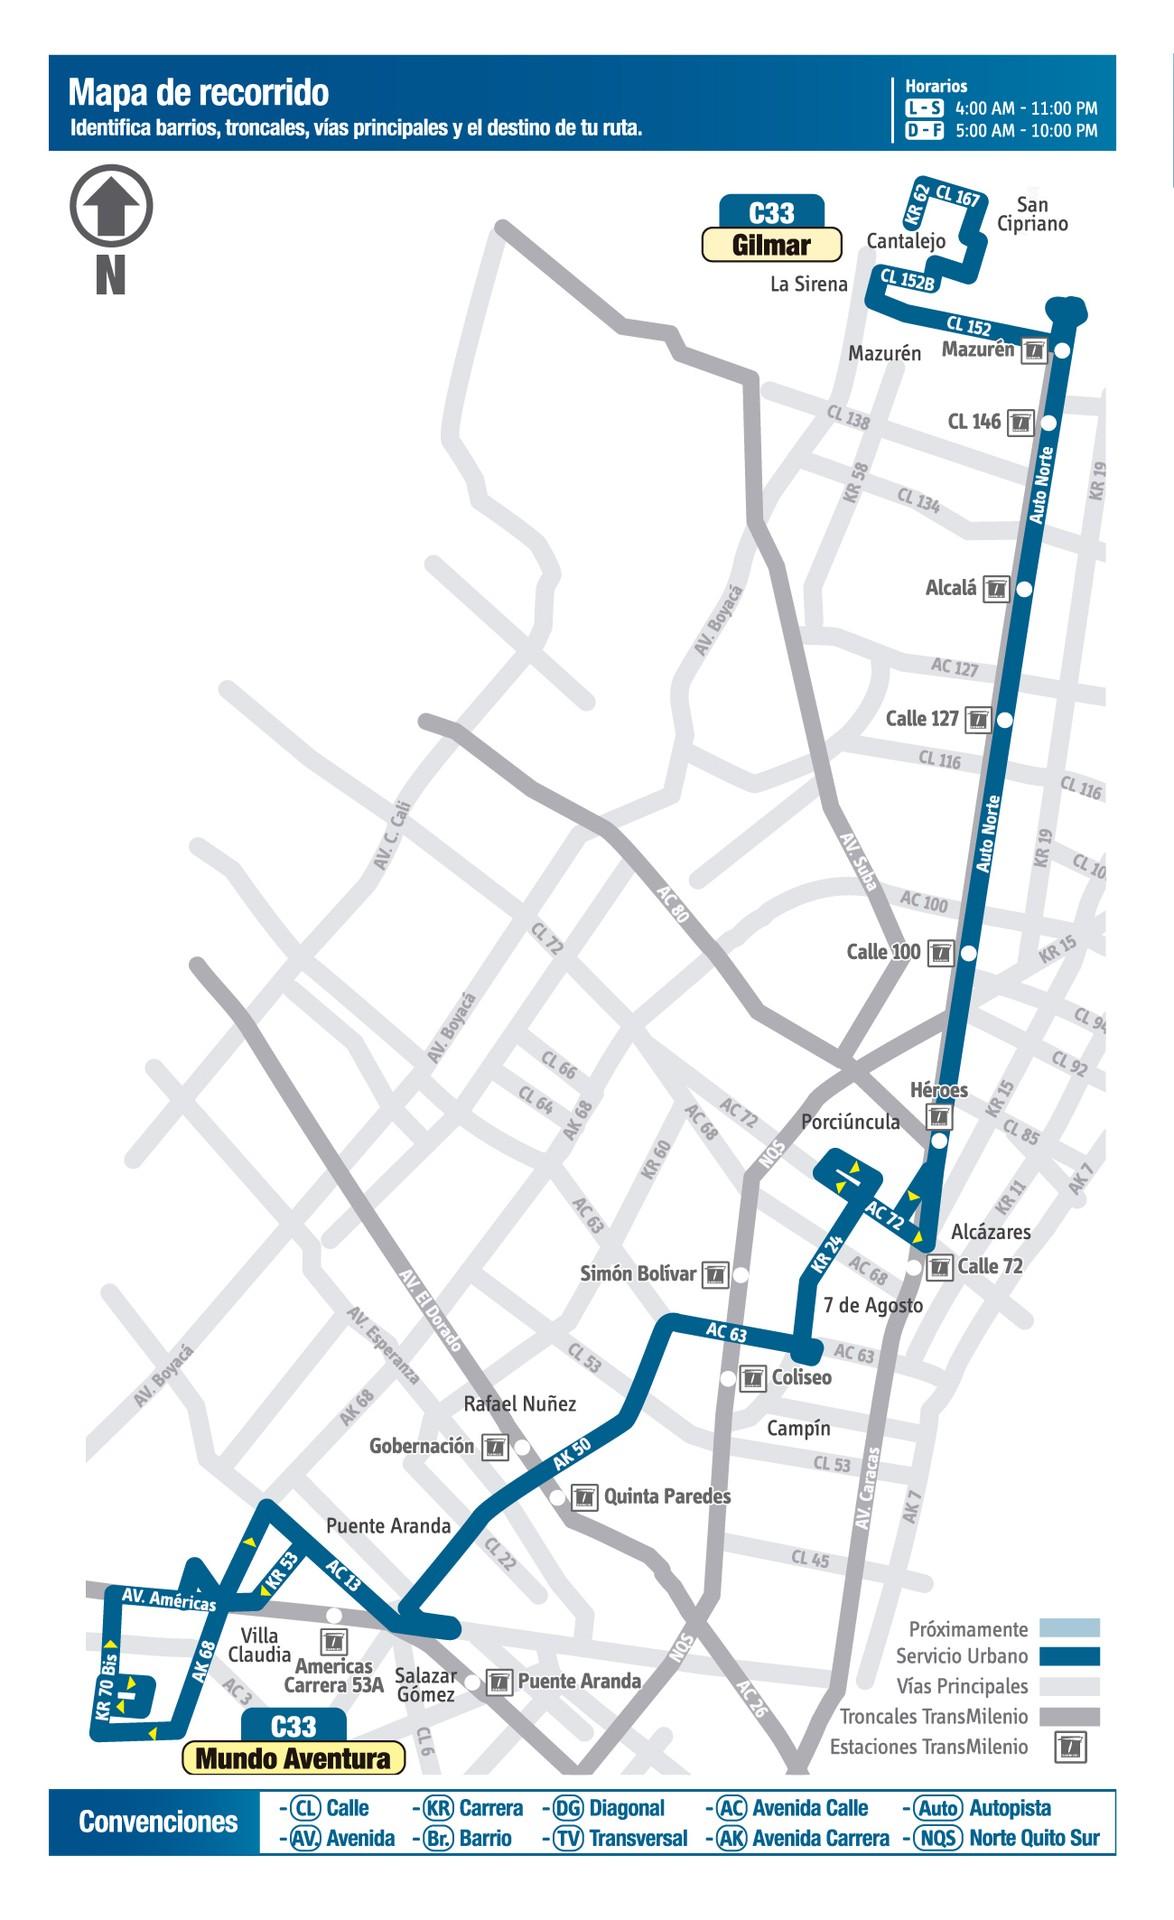 Ruta SITP: C33 Mundo Aventura - Gilmar 1